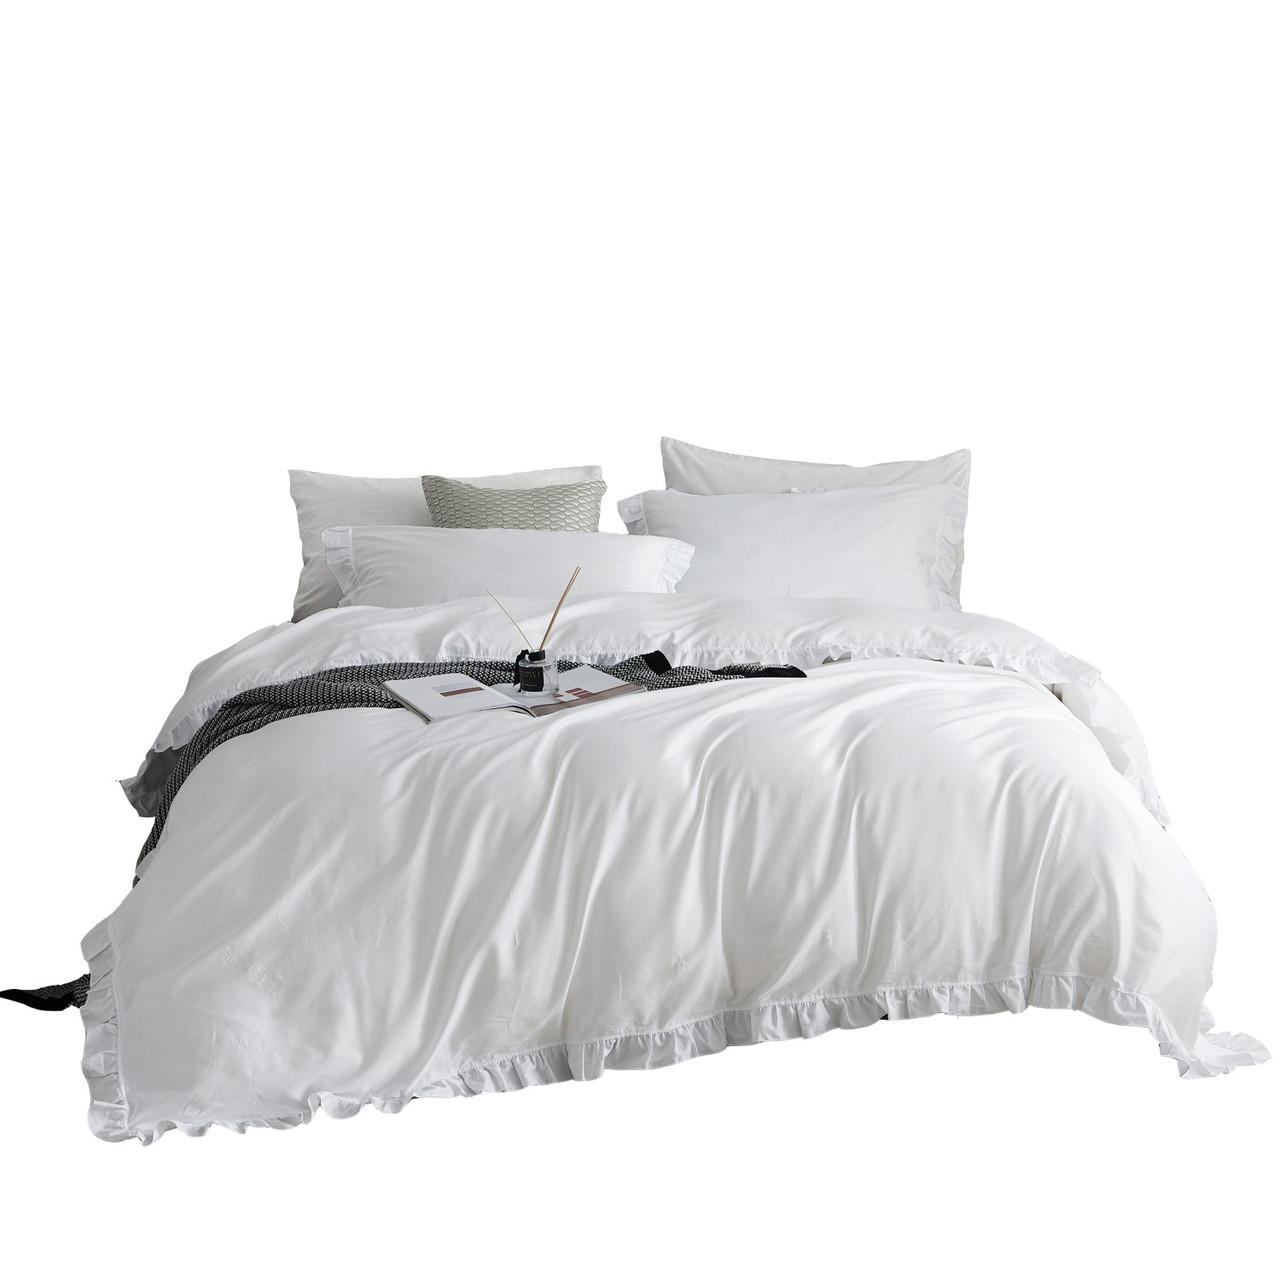 DM807K Ruffle  Bedding 8171460154670